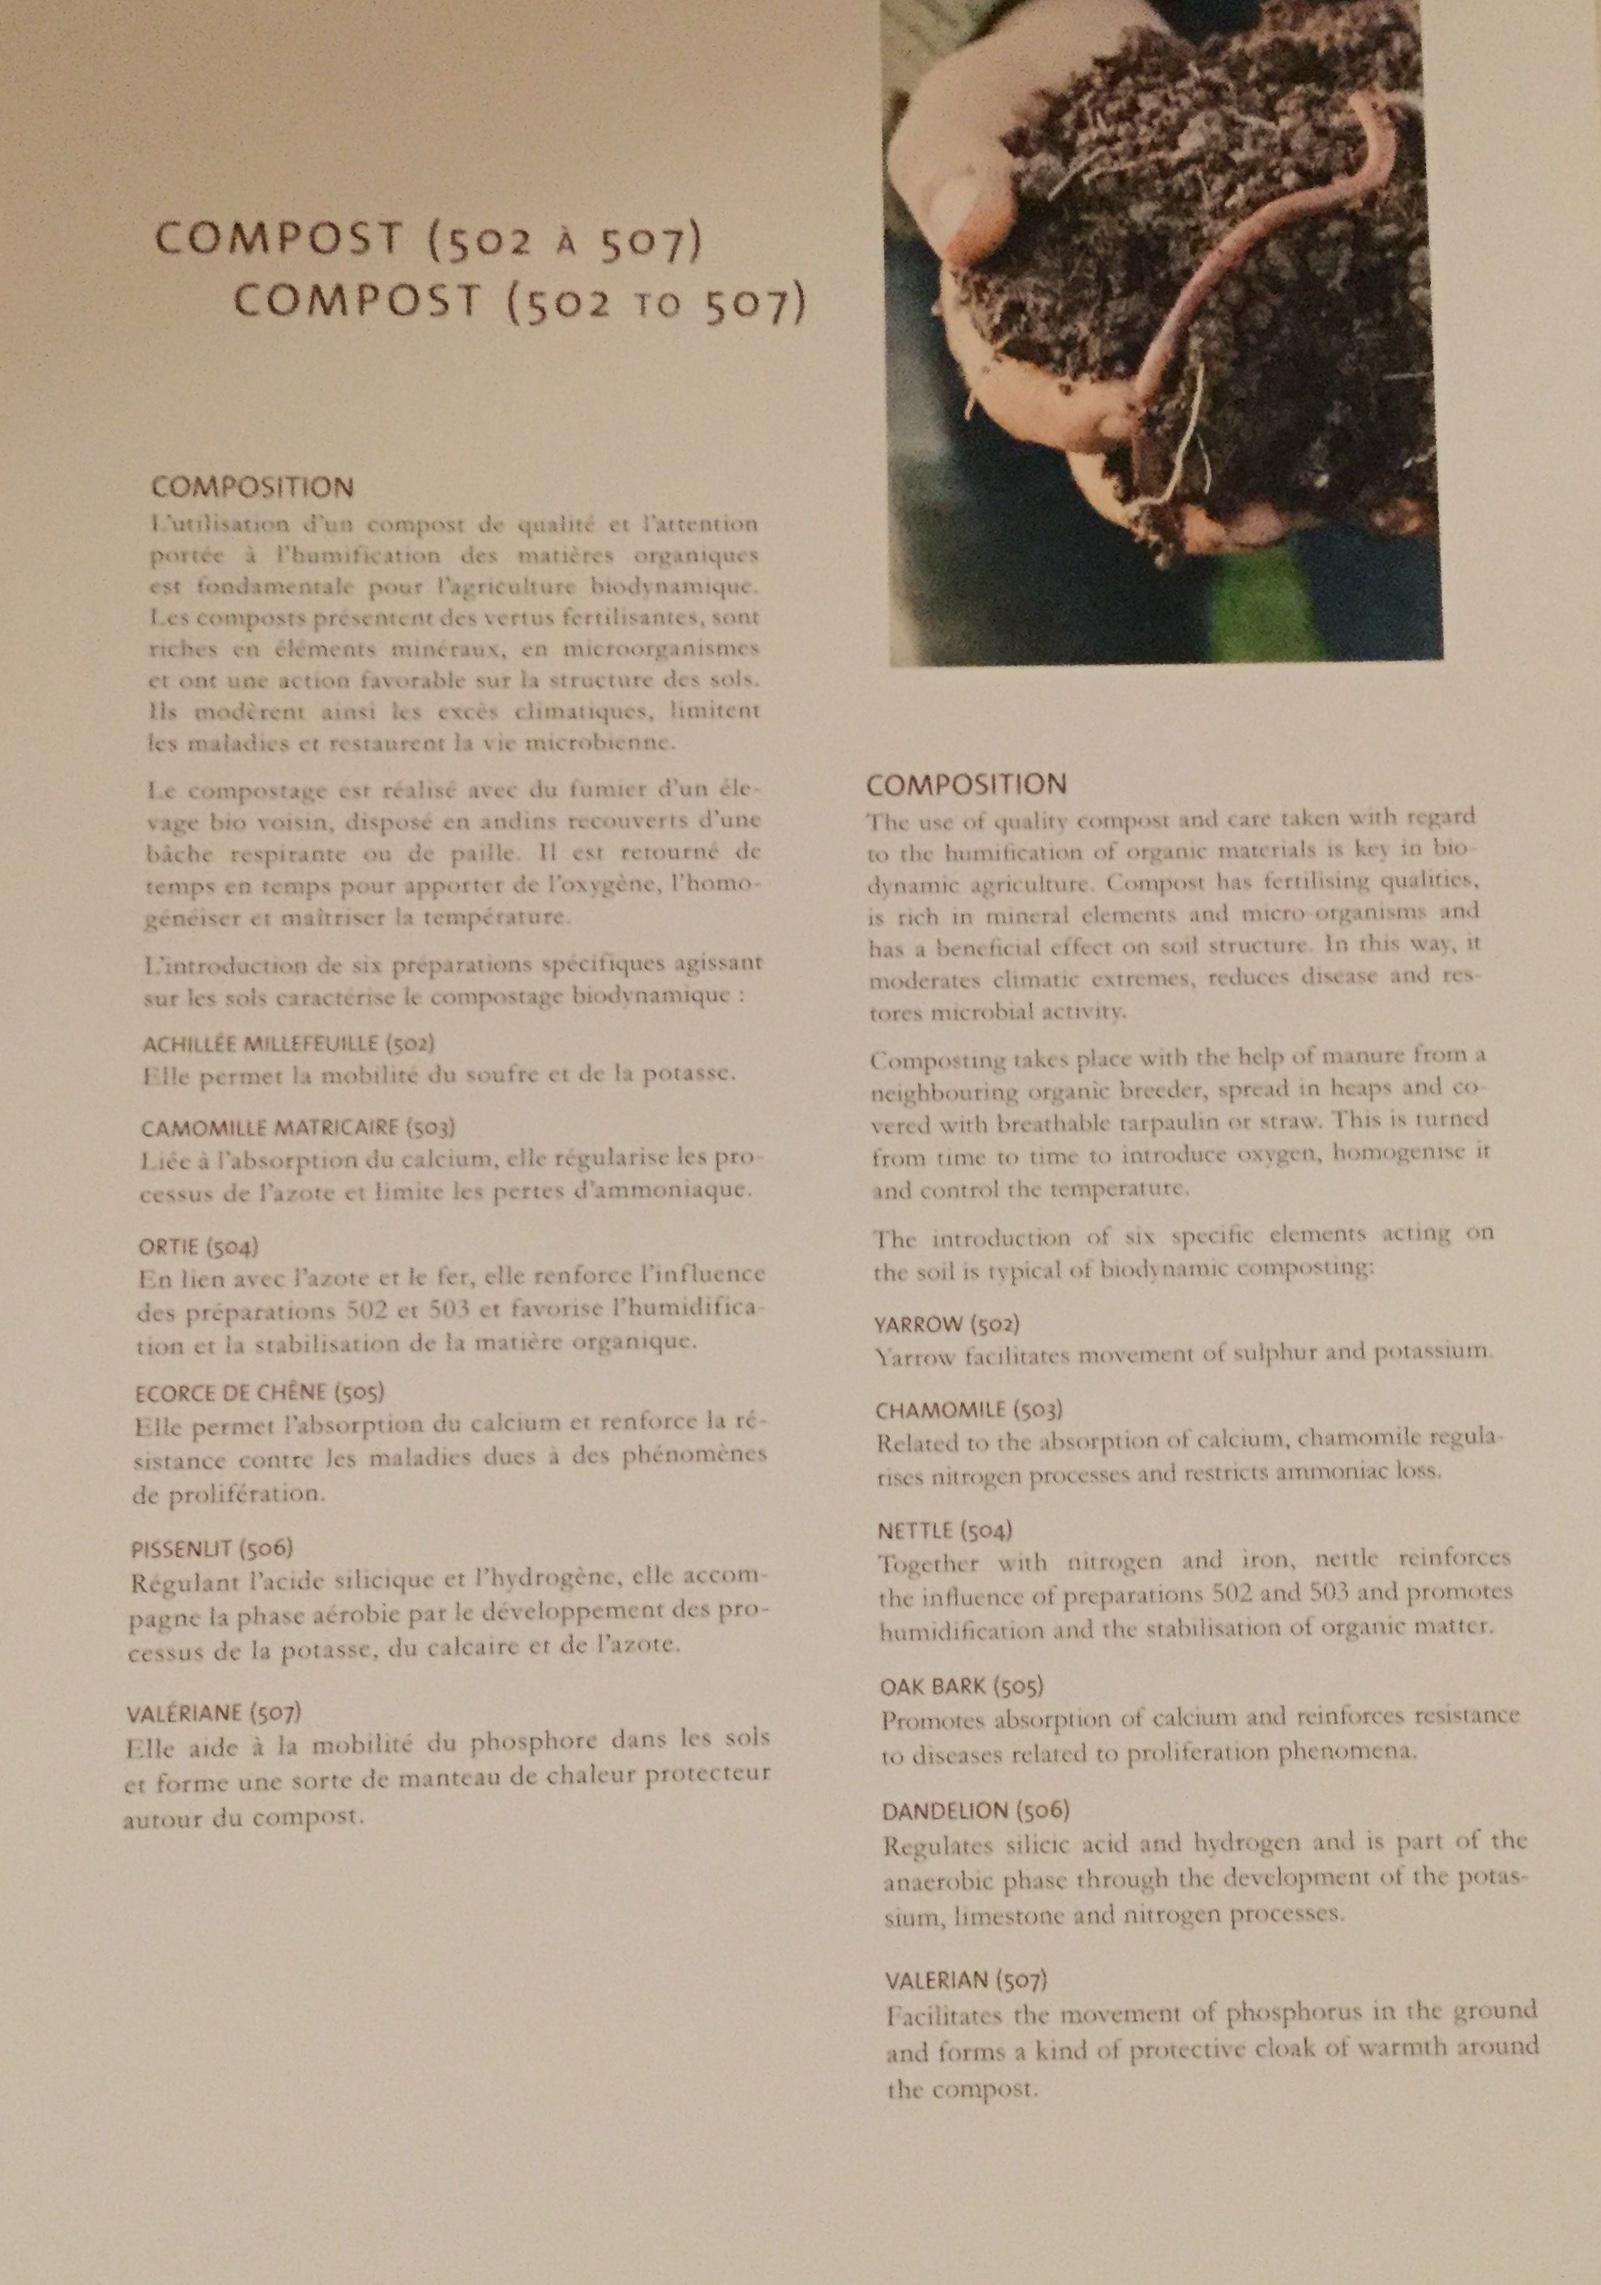 Biodynamic compost description